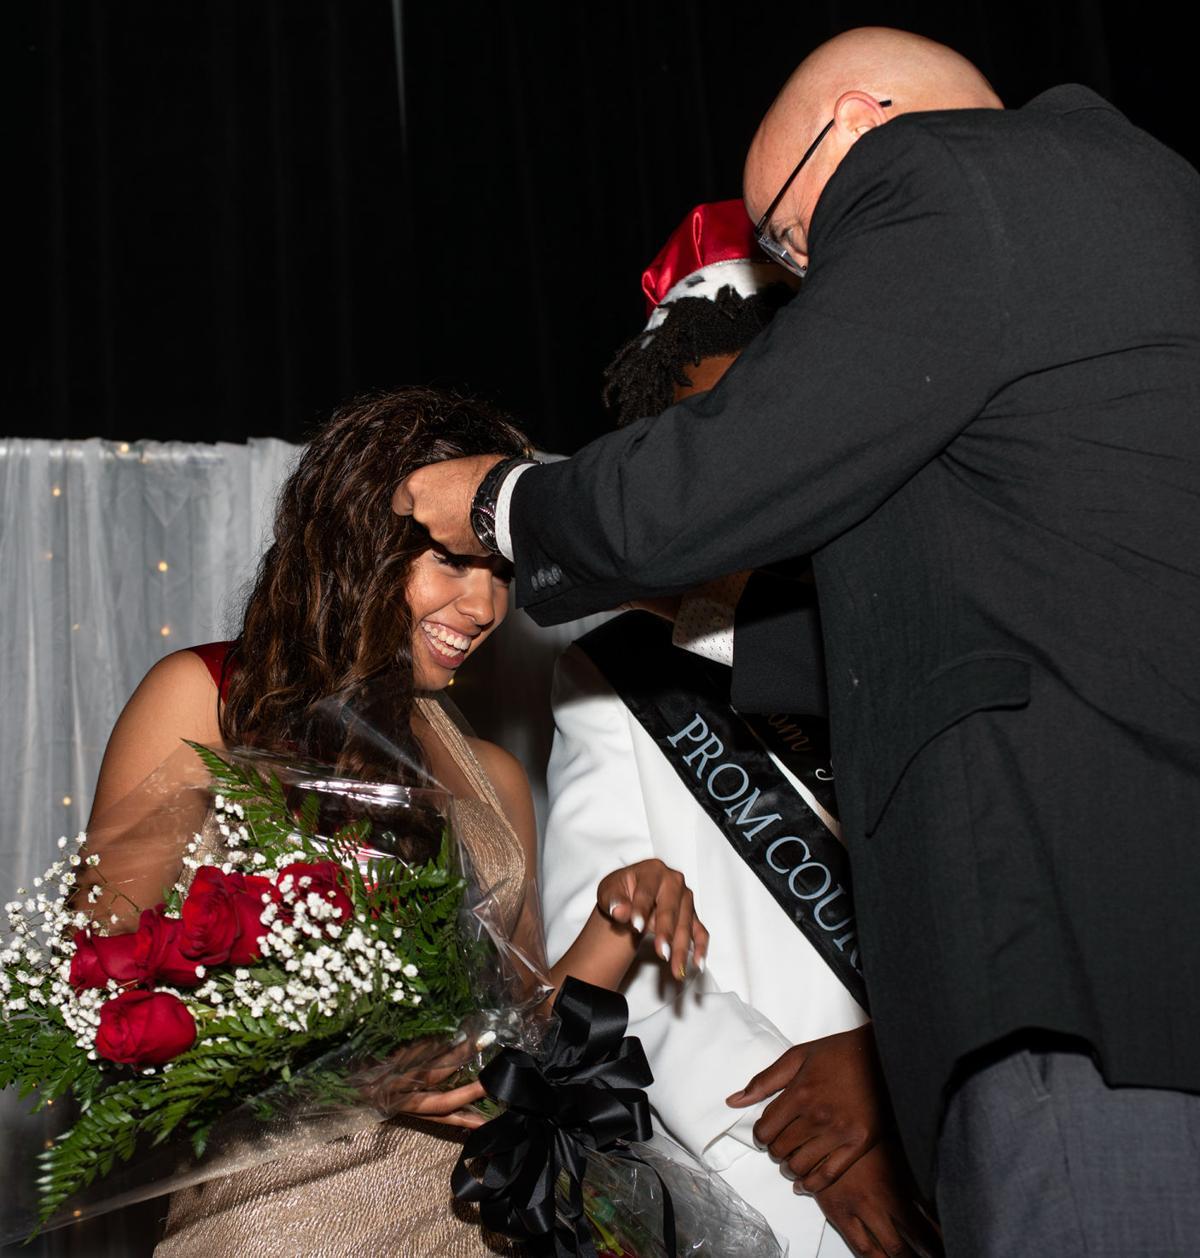 Port Charlotte High School Prom 2019